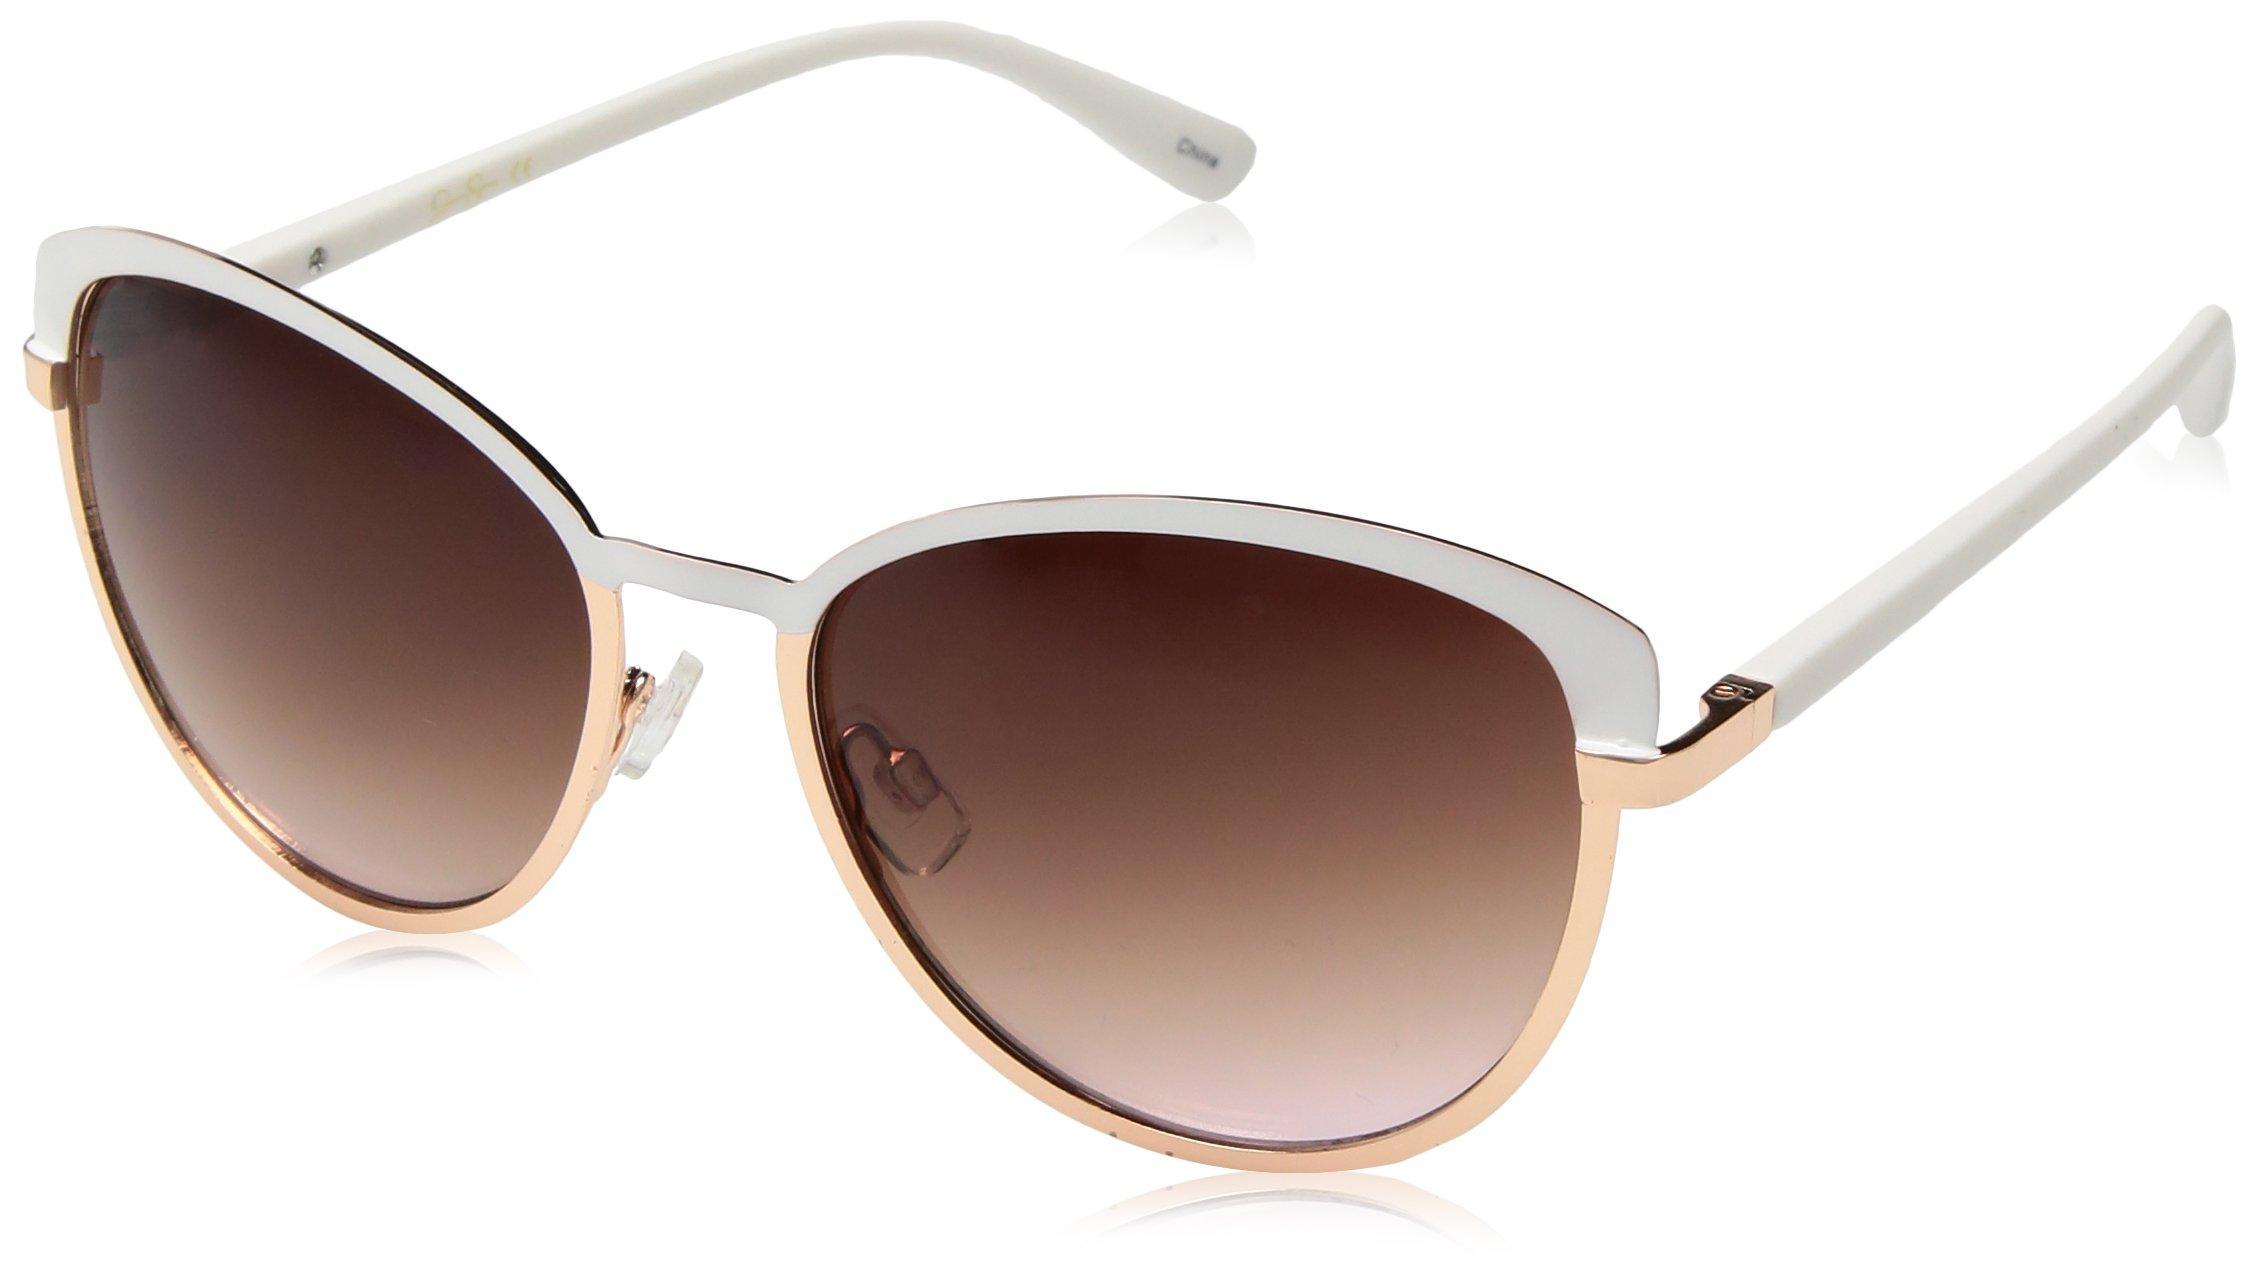 NWT Jessica Simpson J5329-Womens Sunglasses Gold/Brown #